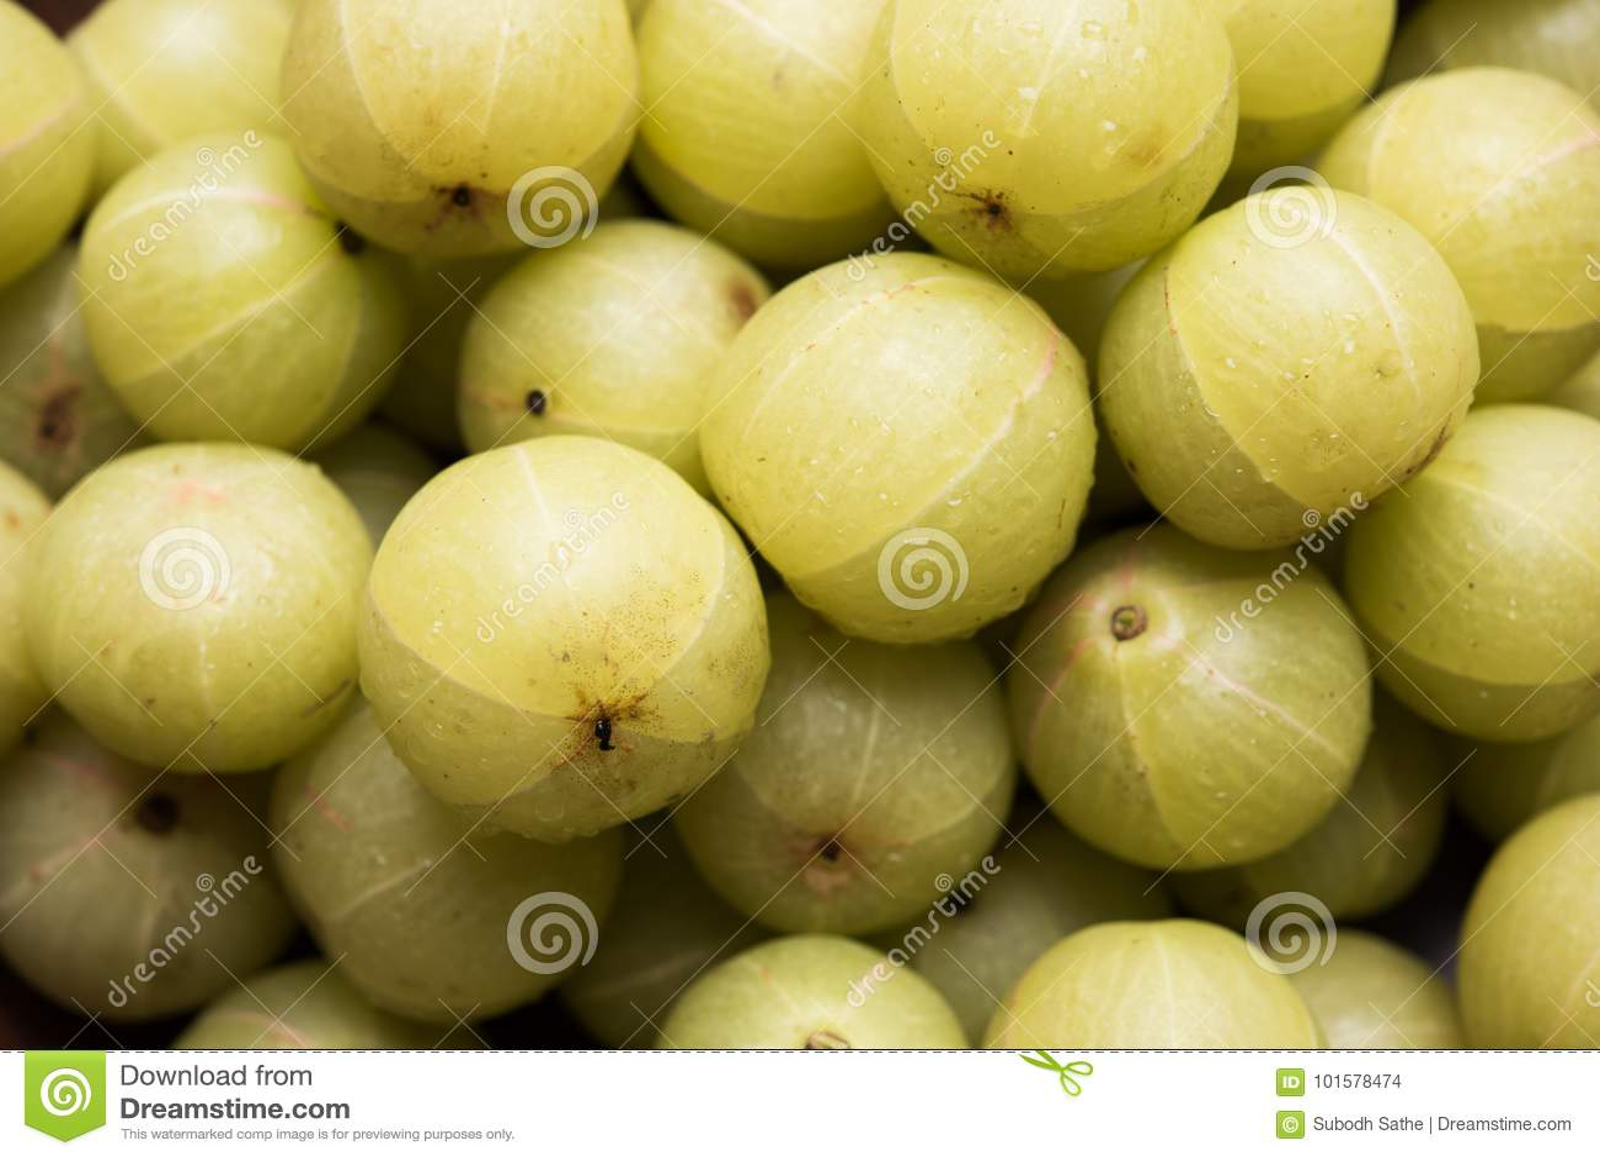 Indian gooseberry or Amla or avla fruit, selective focus